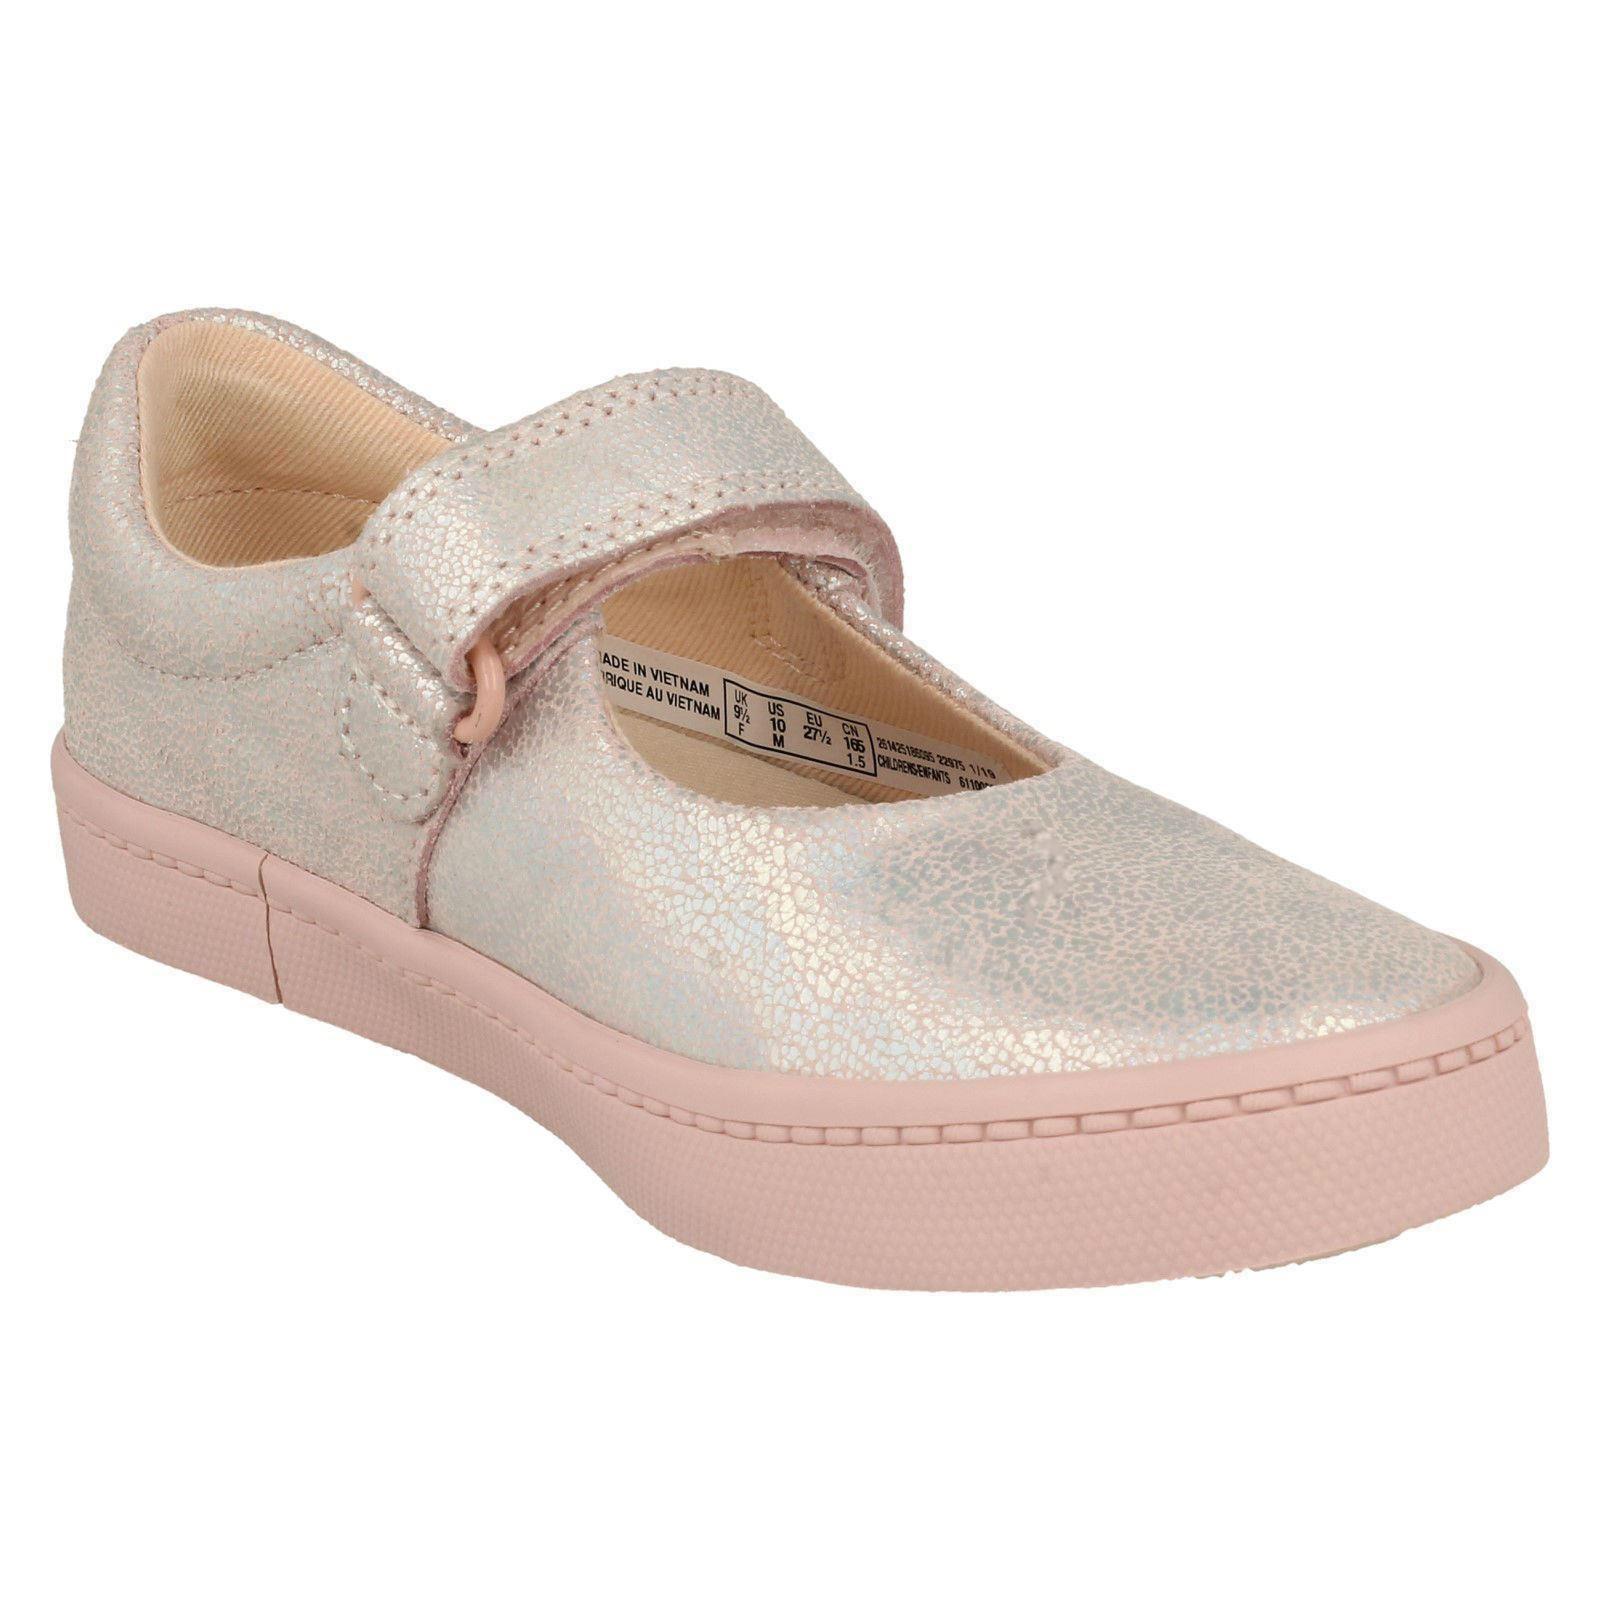 Girls Clarks Stylish Holographic Detailed Shoes City Gleam